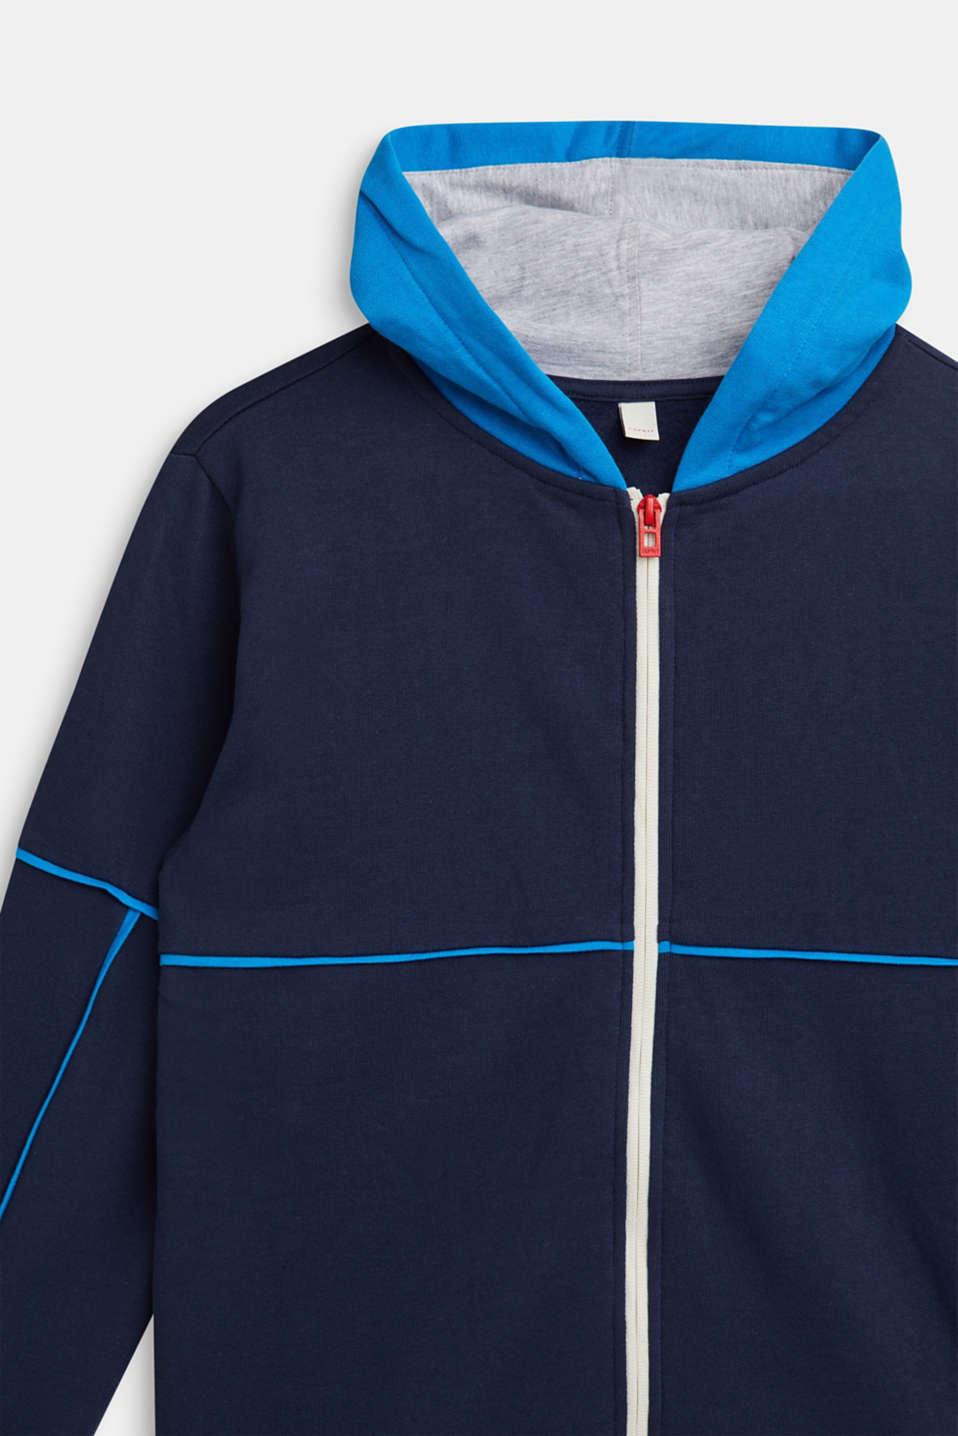 Sweatshirt cardigan with hood and print, LCNAVY, detail image number 2